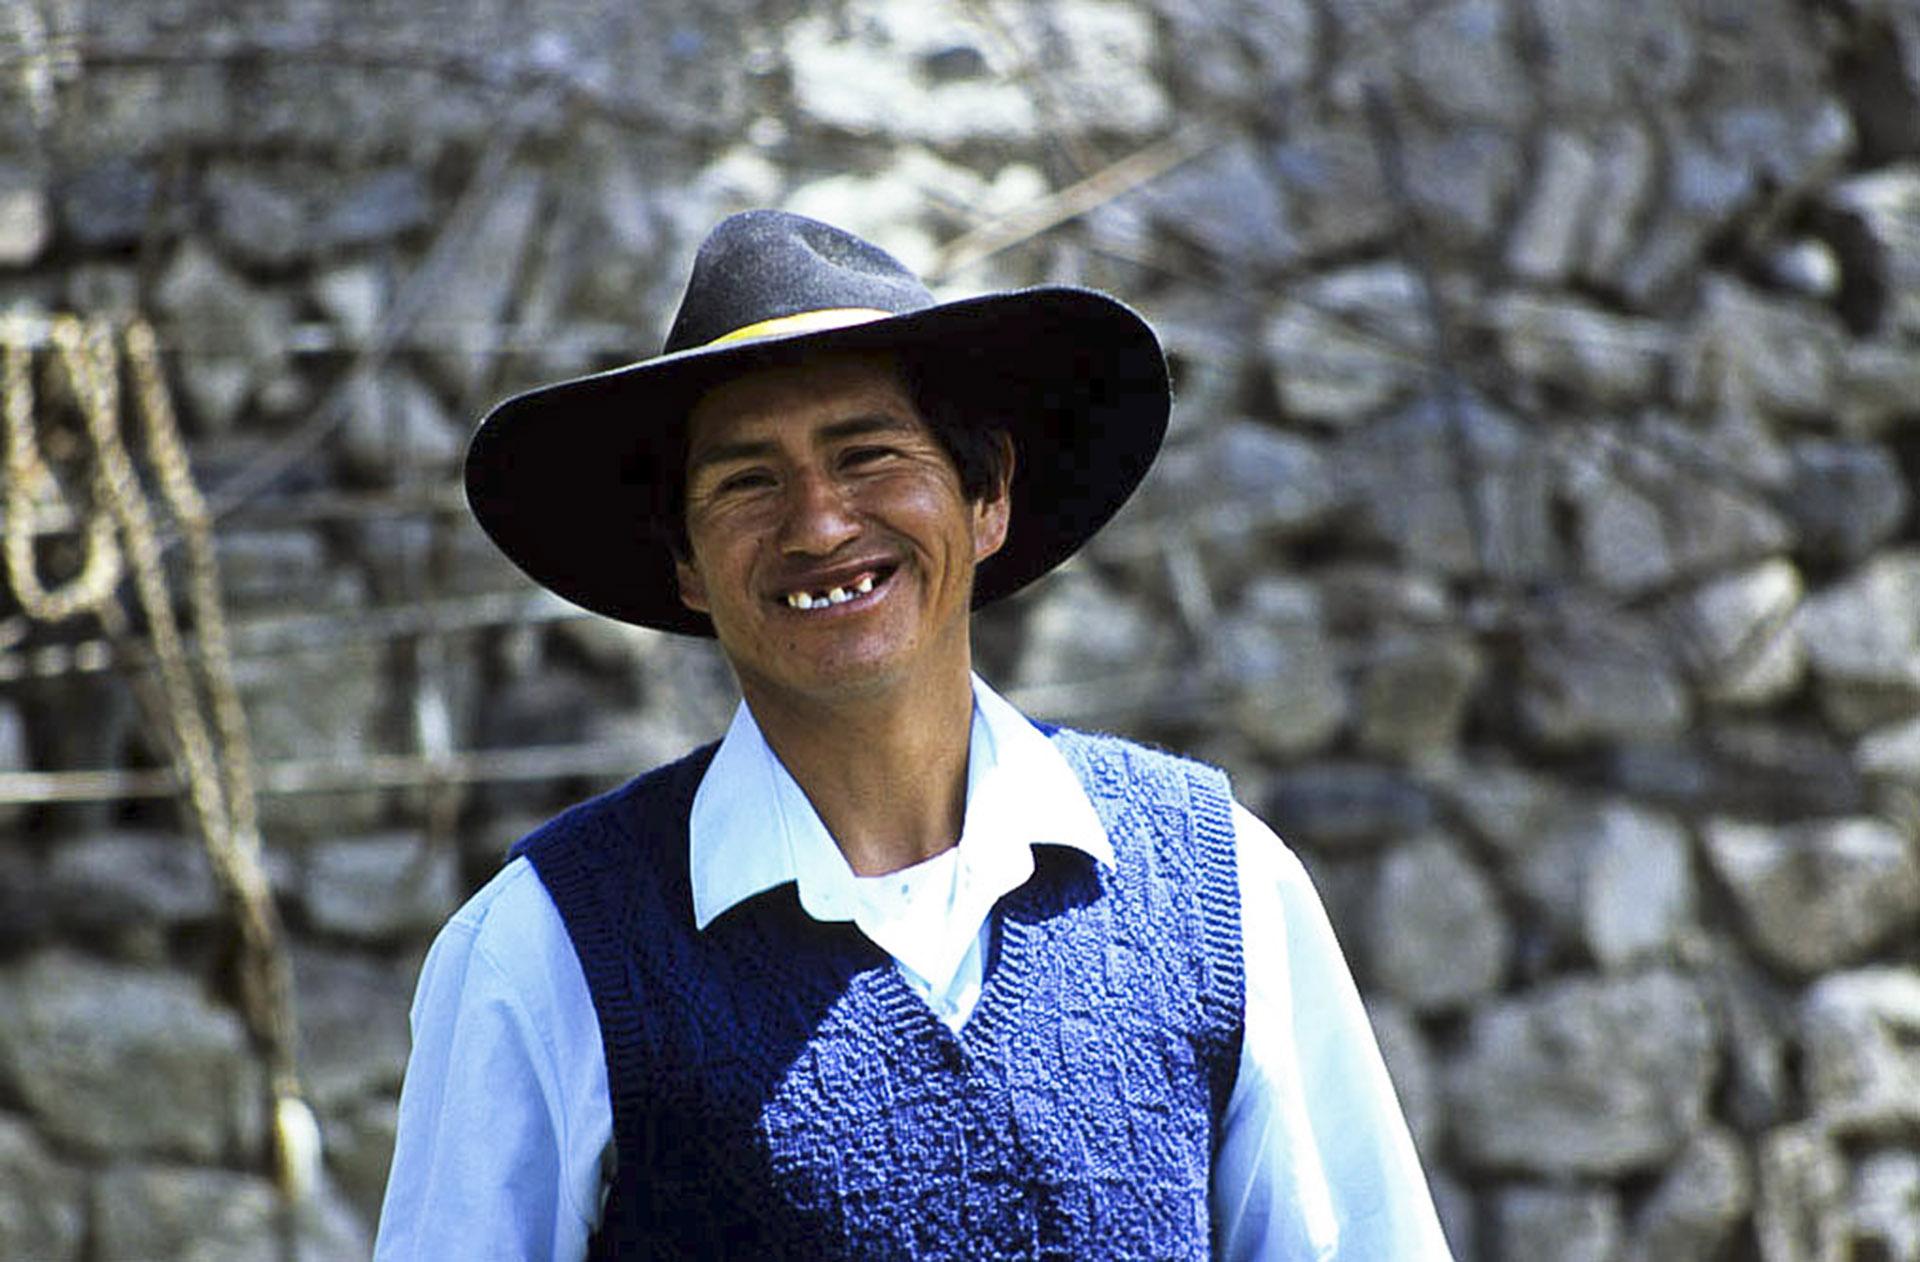 Sourire de Cabanaconde, Pérou.